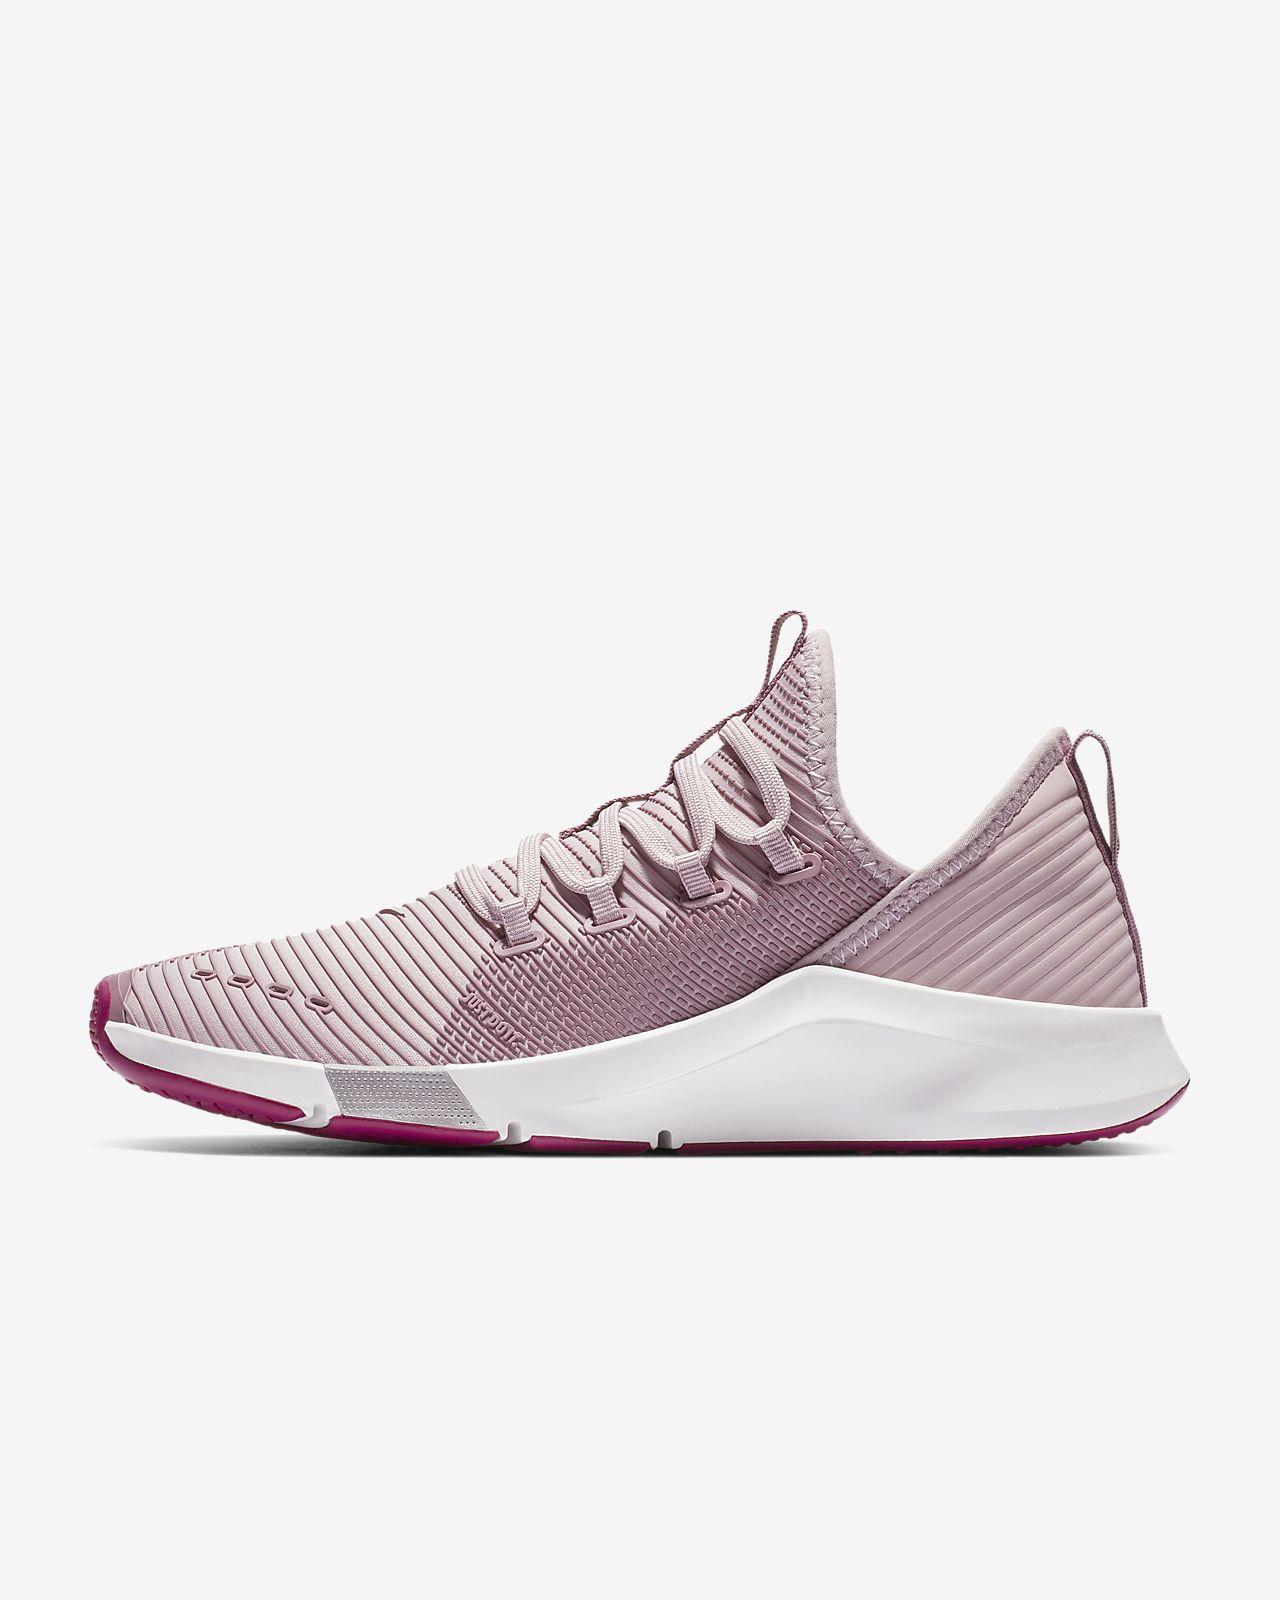 6cefe3786ef Chaussure de training